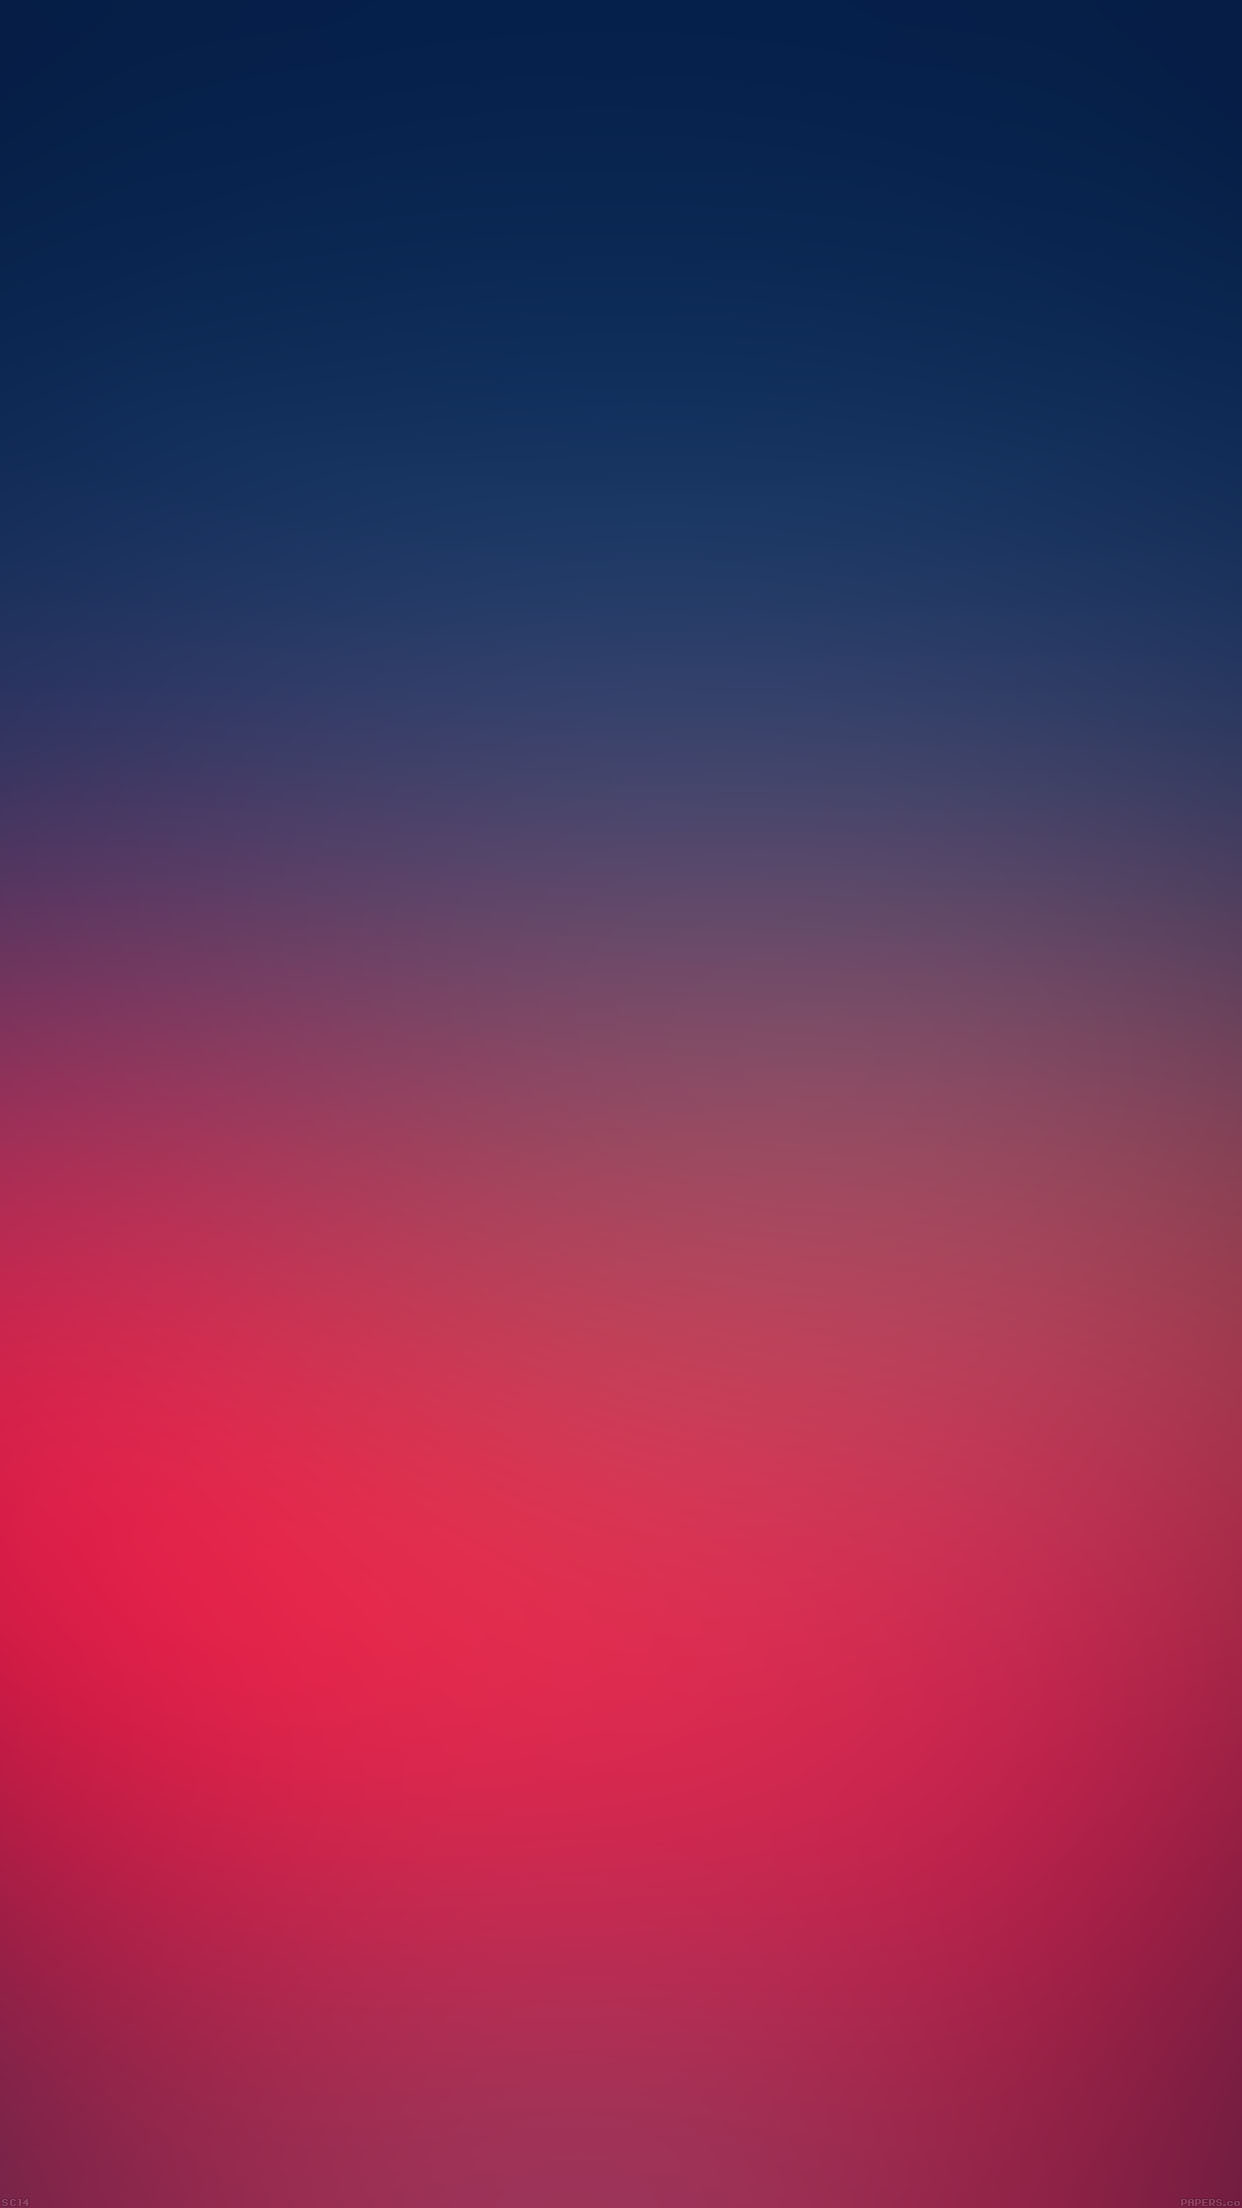 super-bad-blur-34-iphone6-plus-wallpaper